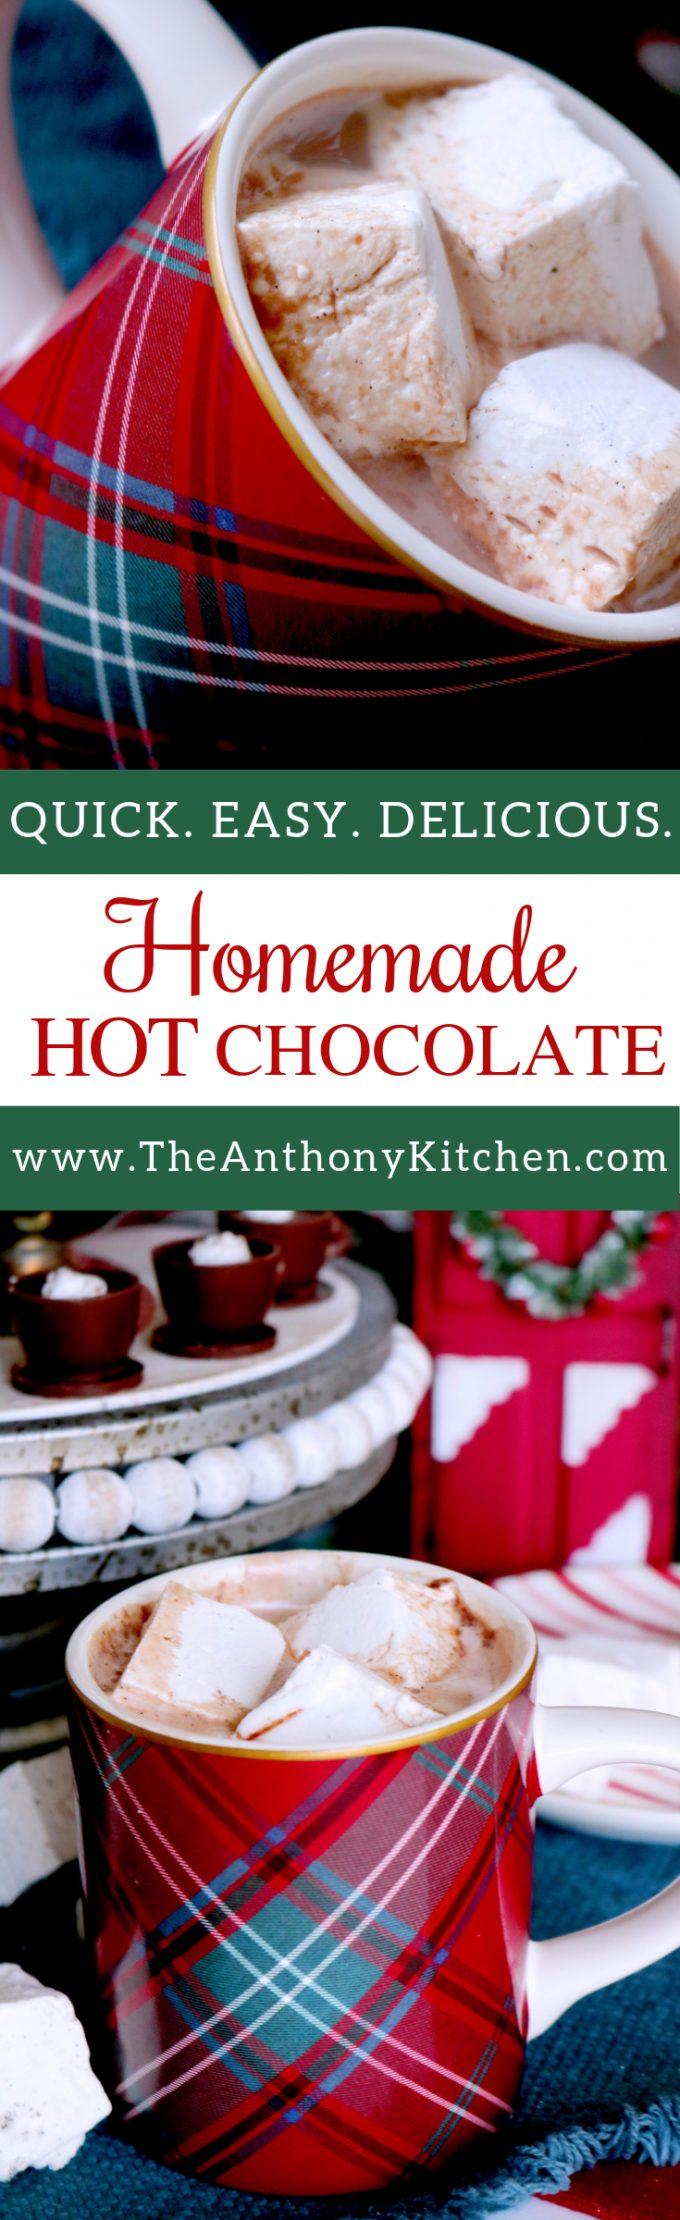 Pinterest image of Hot Chocolate